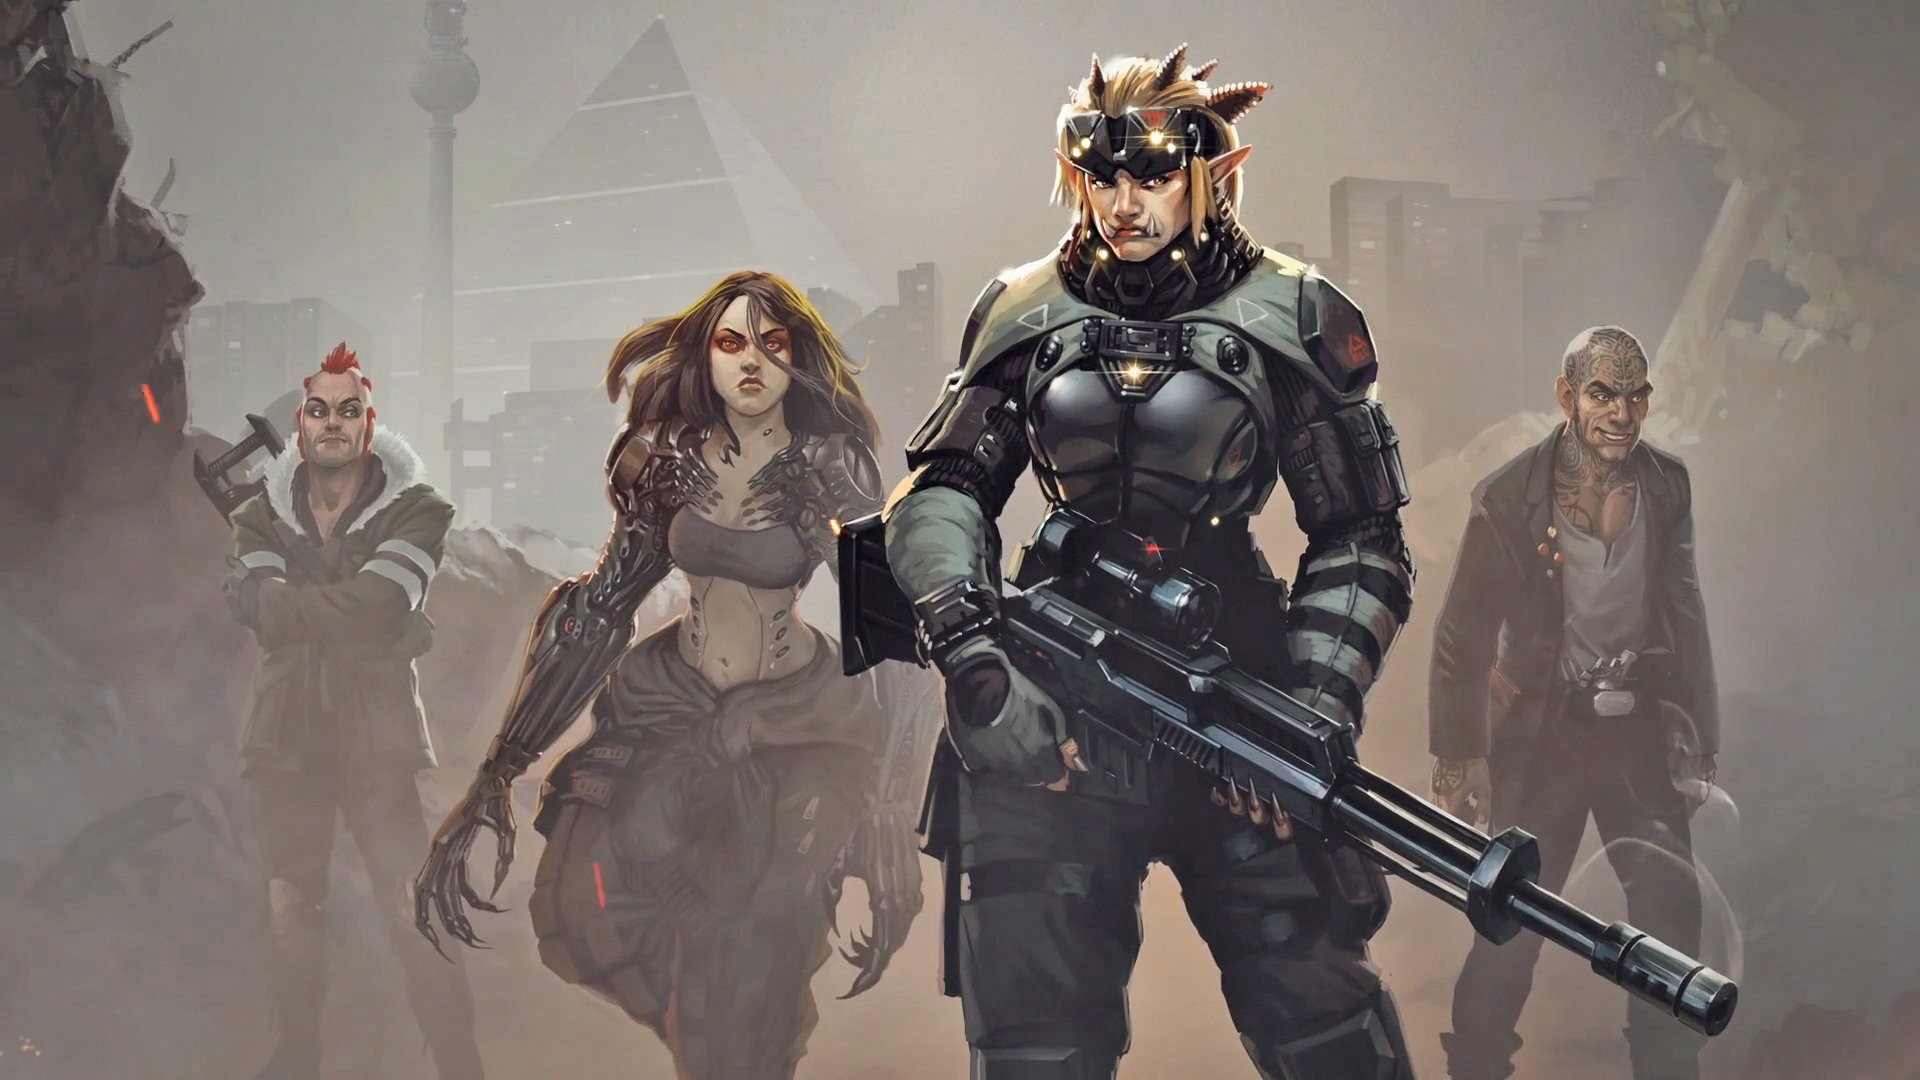 SHADOWRUN cardgame game mmo online fantasy sci-fi warrior fighting  cyberpunk shooter (8) wallpaper | | 348422 | WallpaperUP